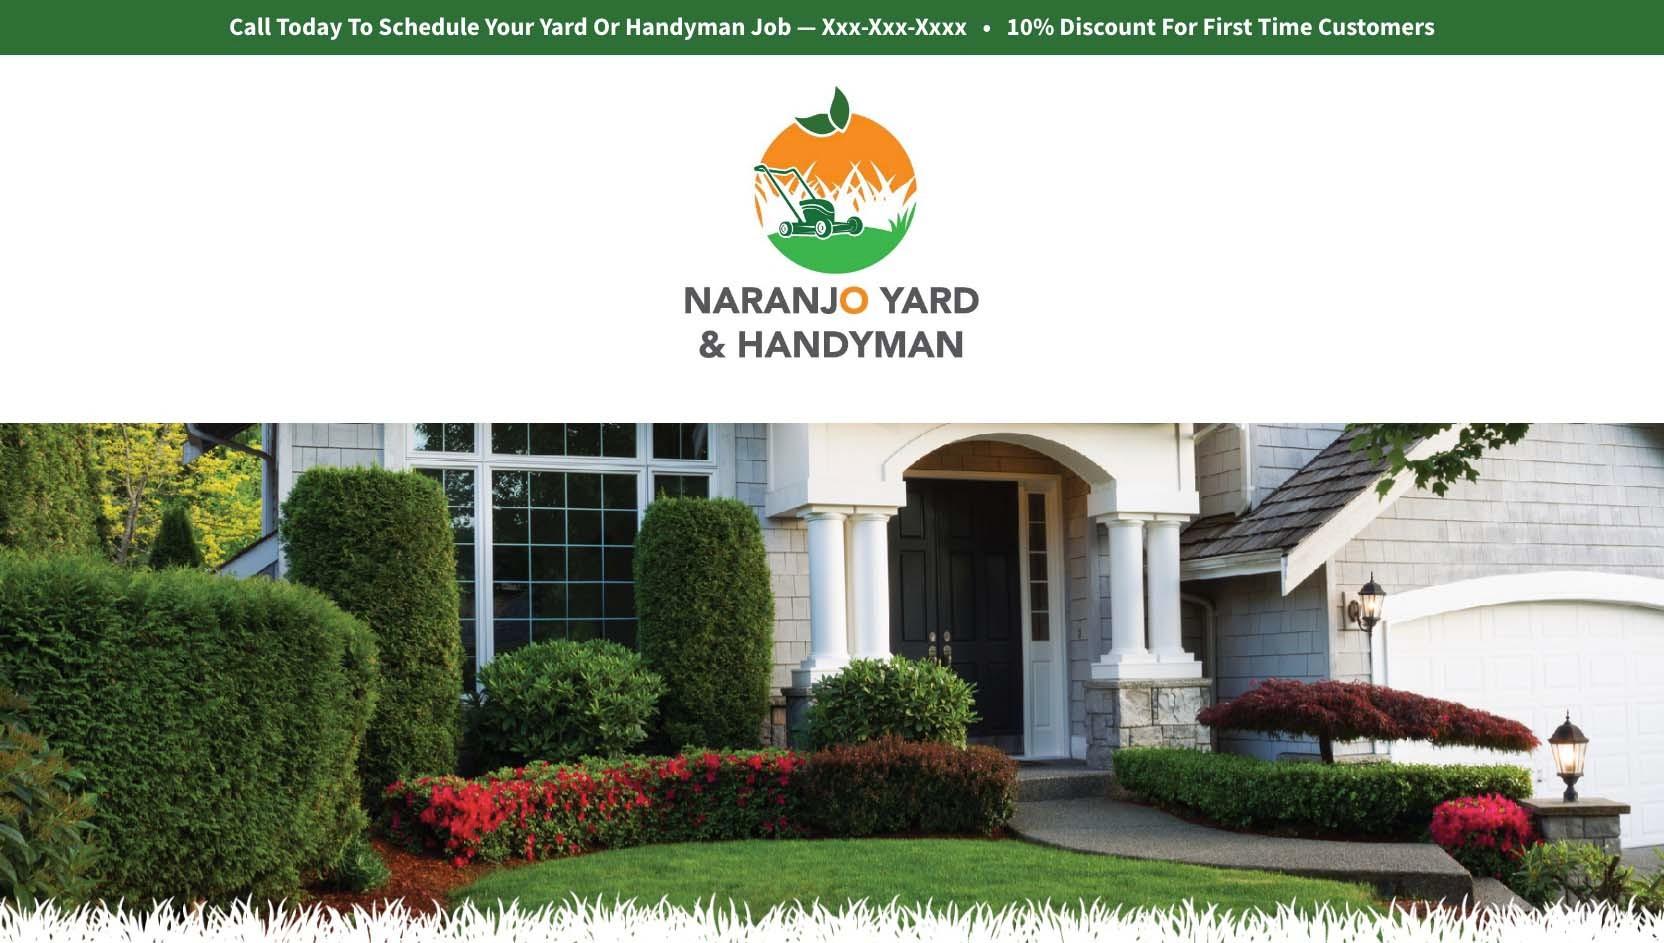 naranjo_homepage_capture_1